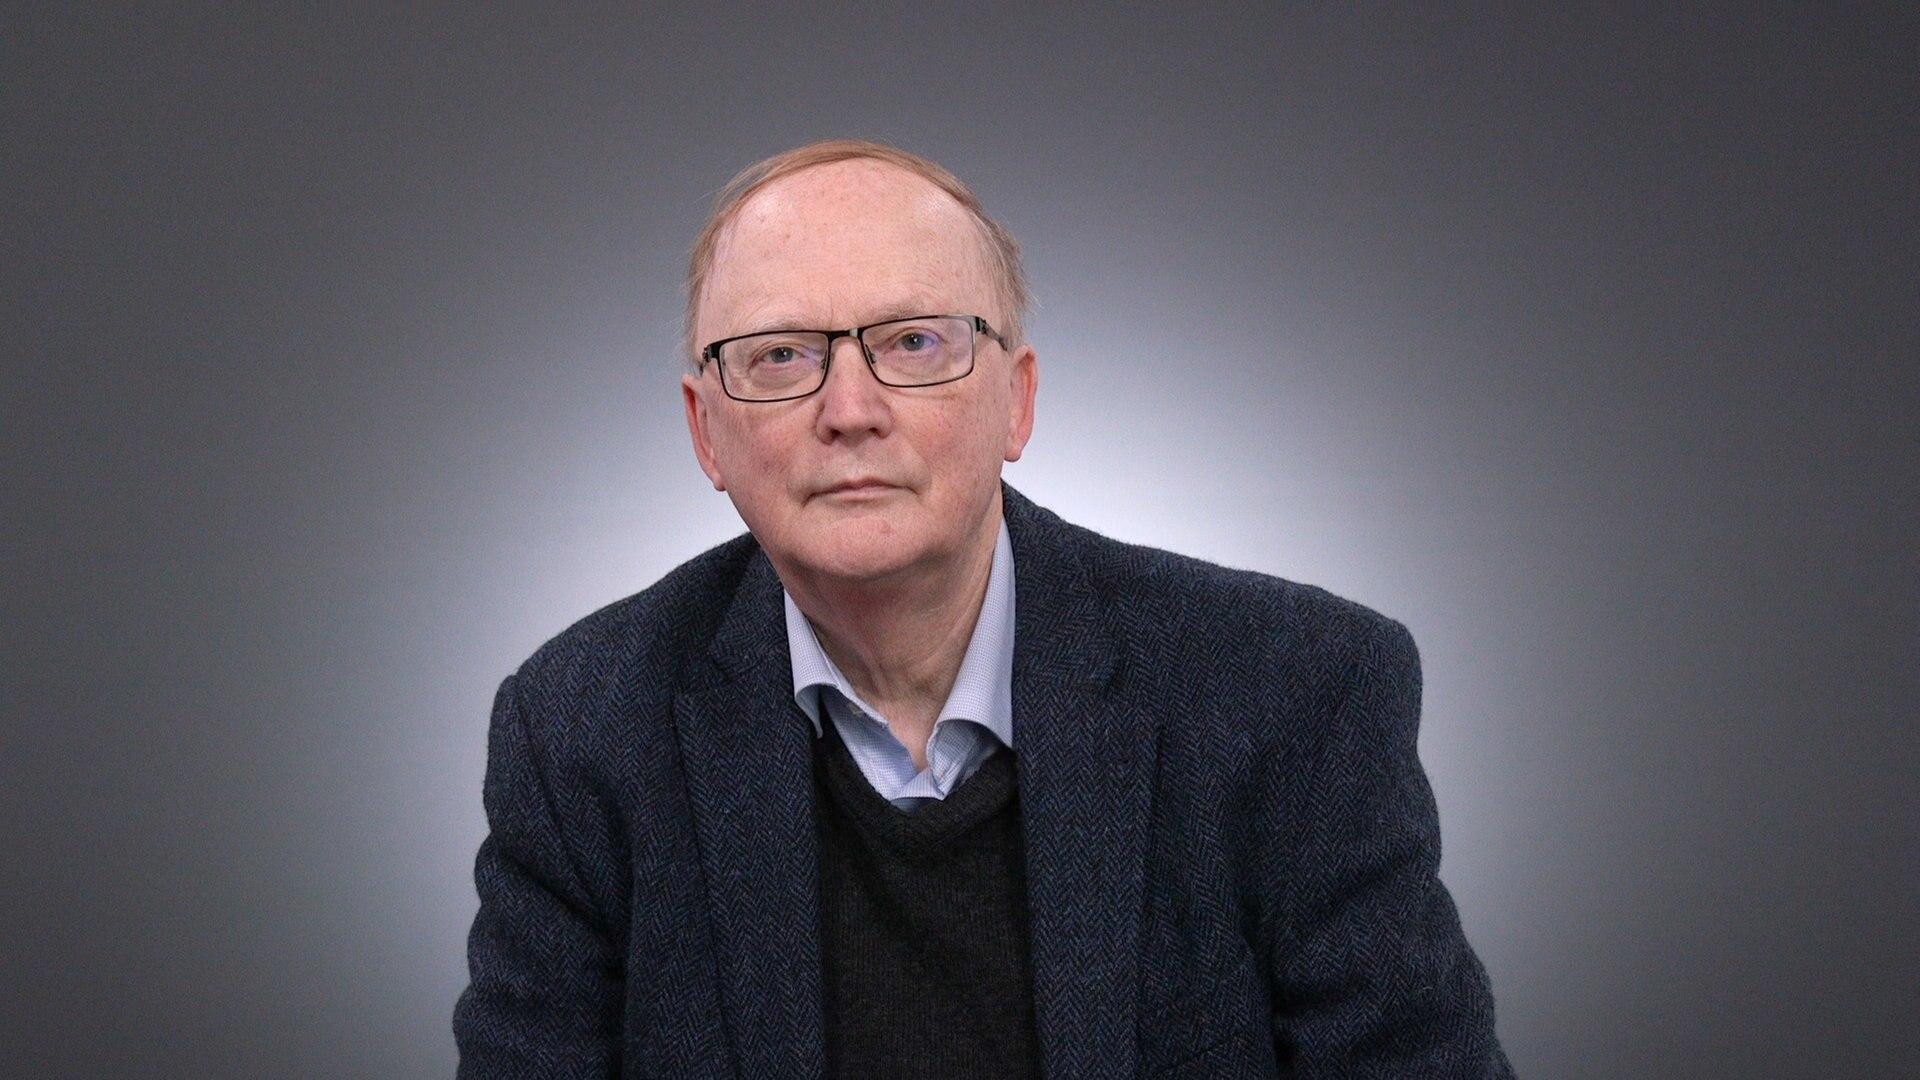 Kurt Duwe, FDP